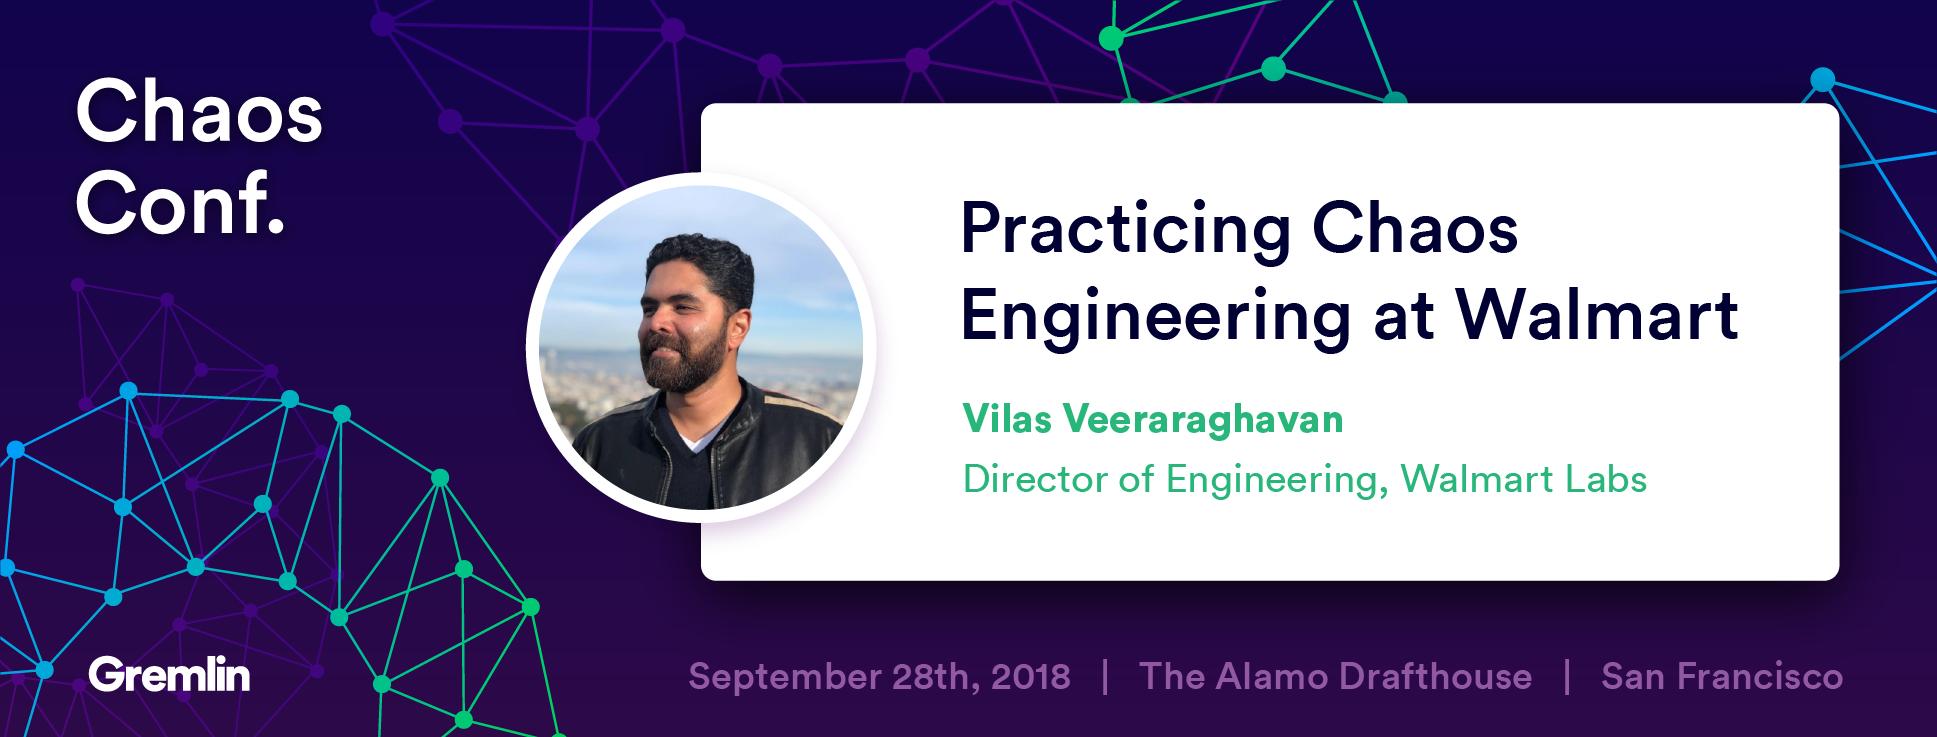 "Vilas Veeraraghaven: ""Practicing Chaos Engineering at Walmart"" - Chaos Conf 2018"